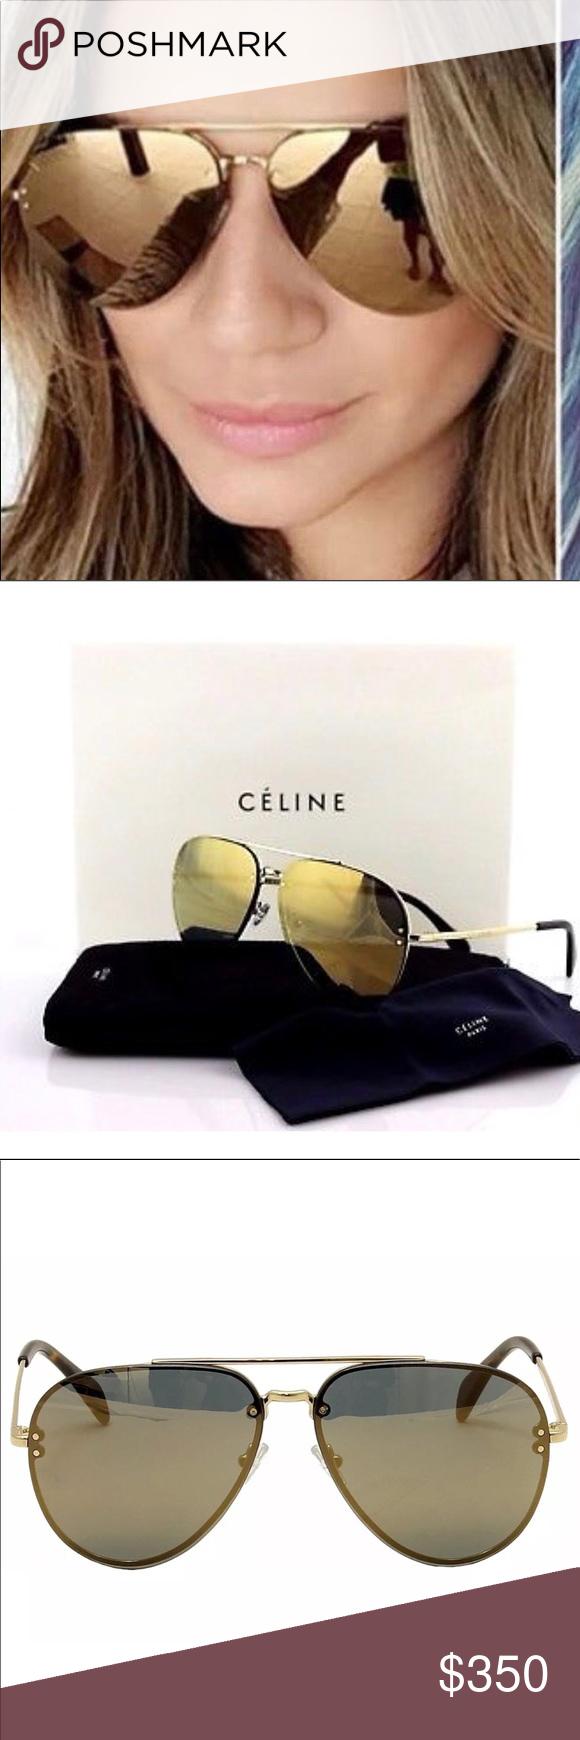 26c736dc46a Brand New Celine Aviator Sunglassez Brand New Celine CL 41391S 41391 S J5G  MV